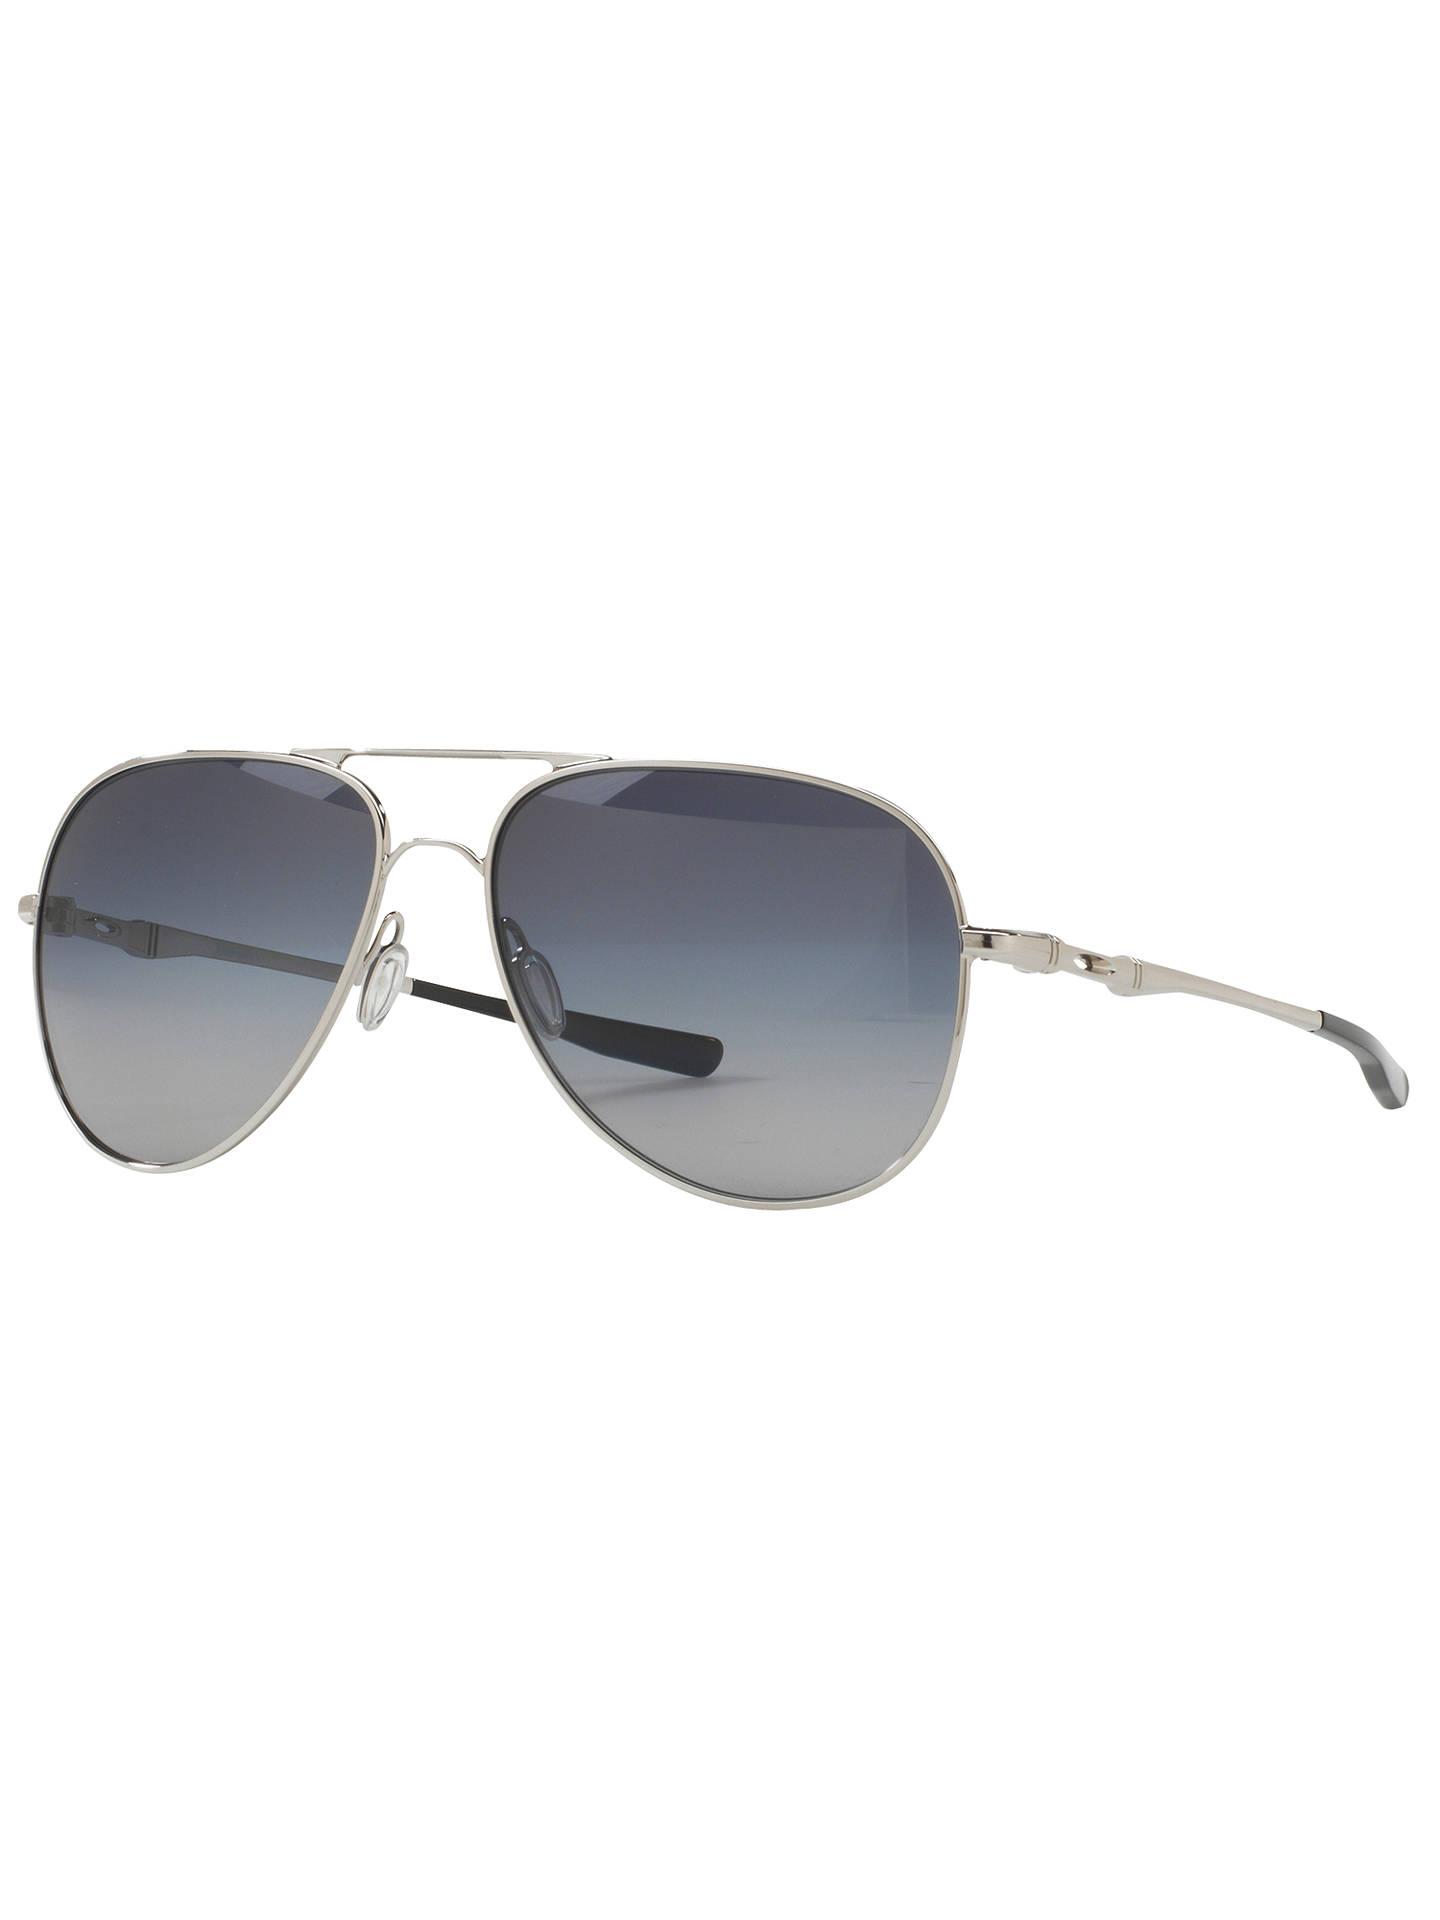 7566a9d33b Oakley OO4119 Elmont Large Polarised Aviator Sunglasses at John ...